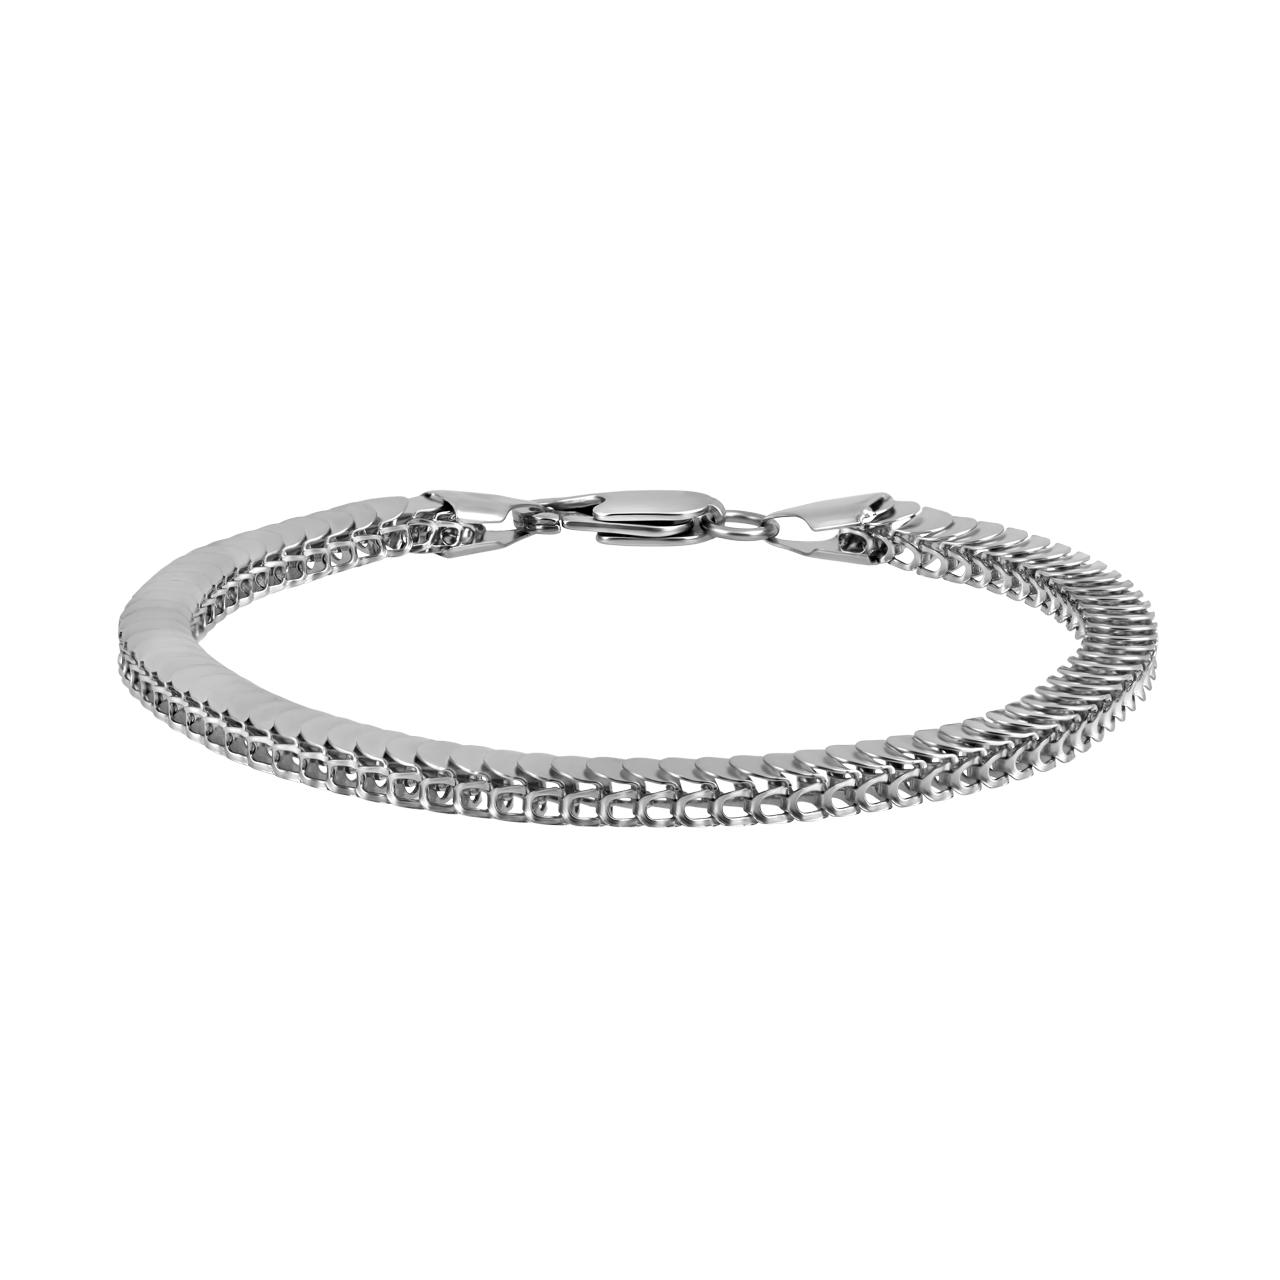 دستبند مردانه اقلیمه کد DS462